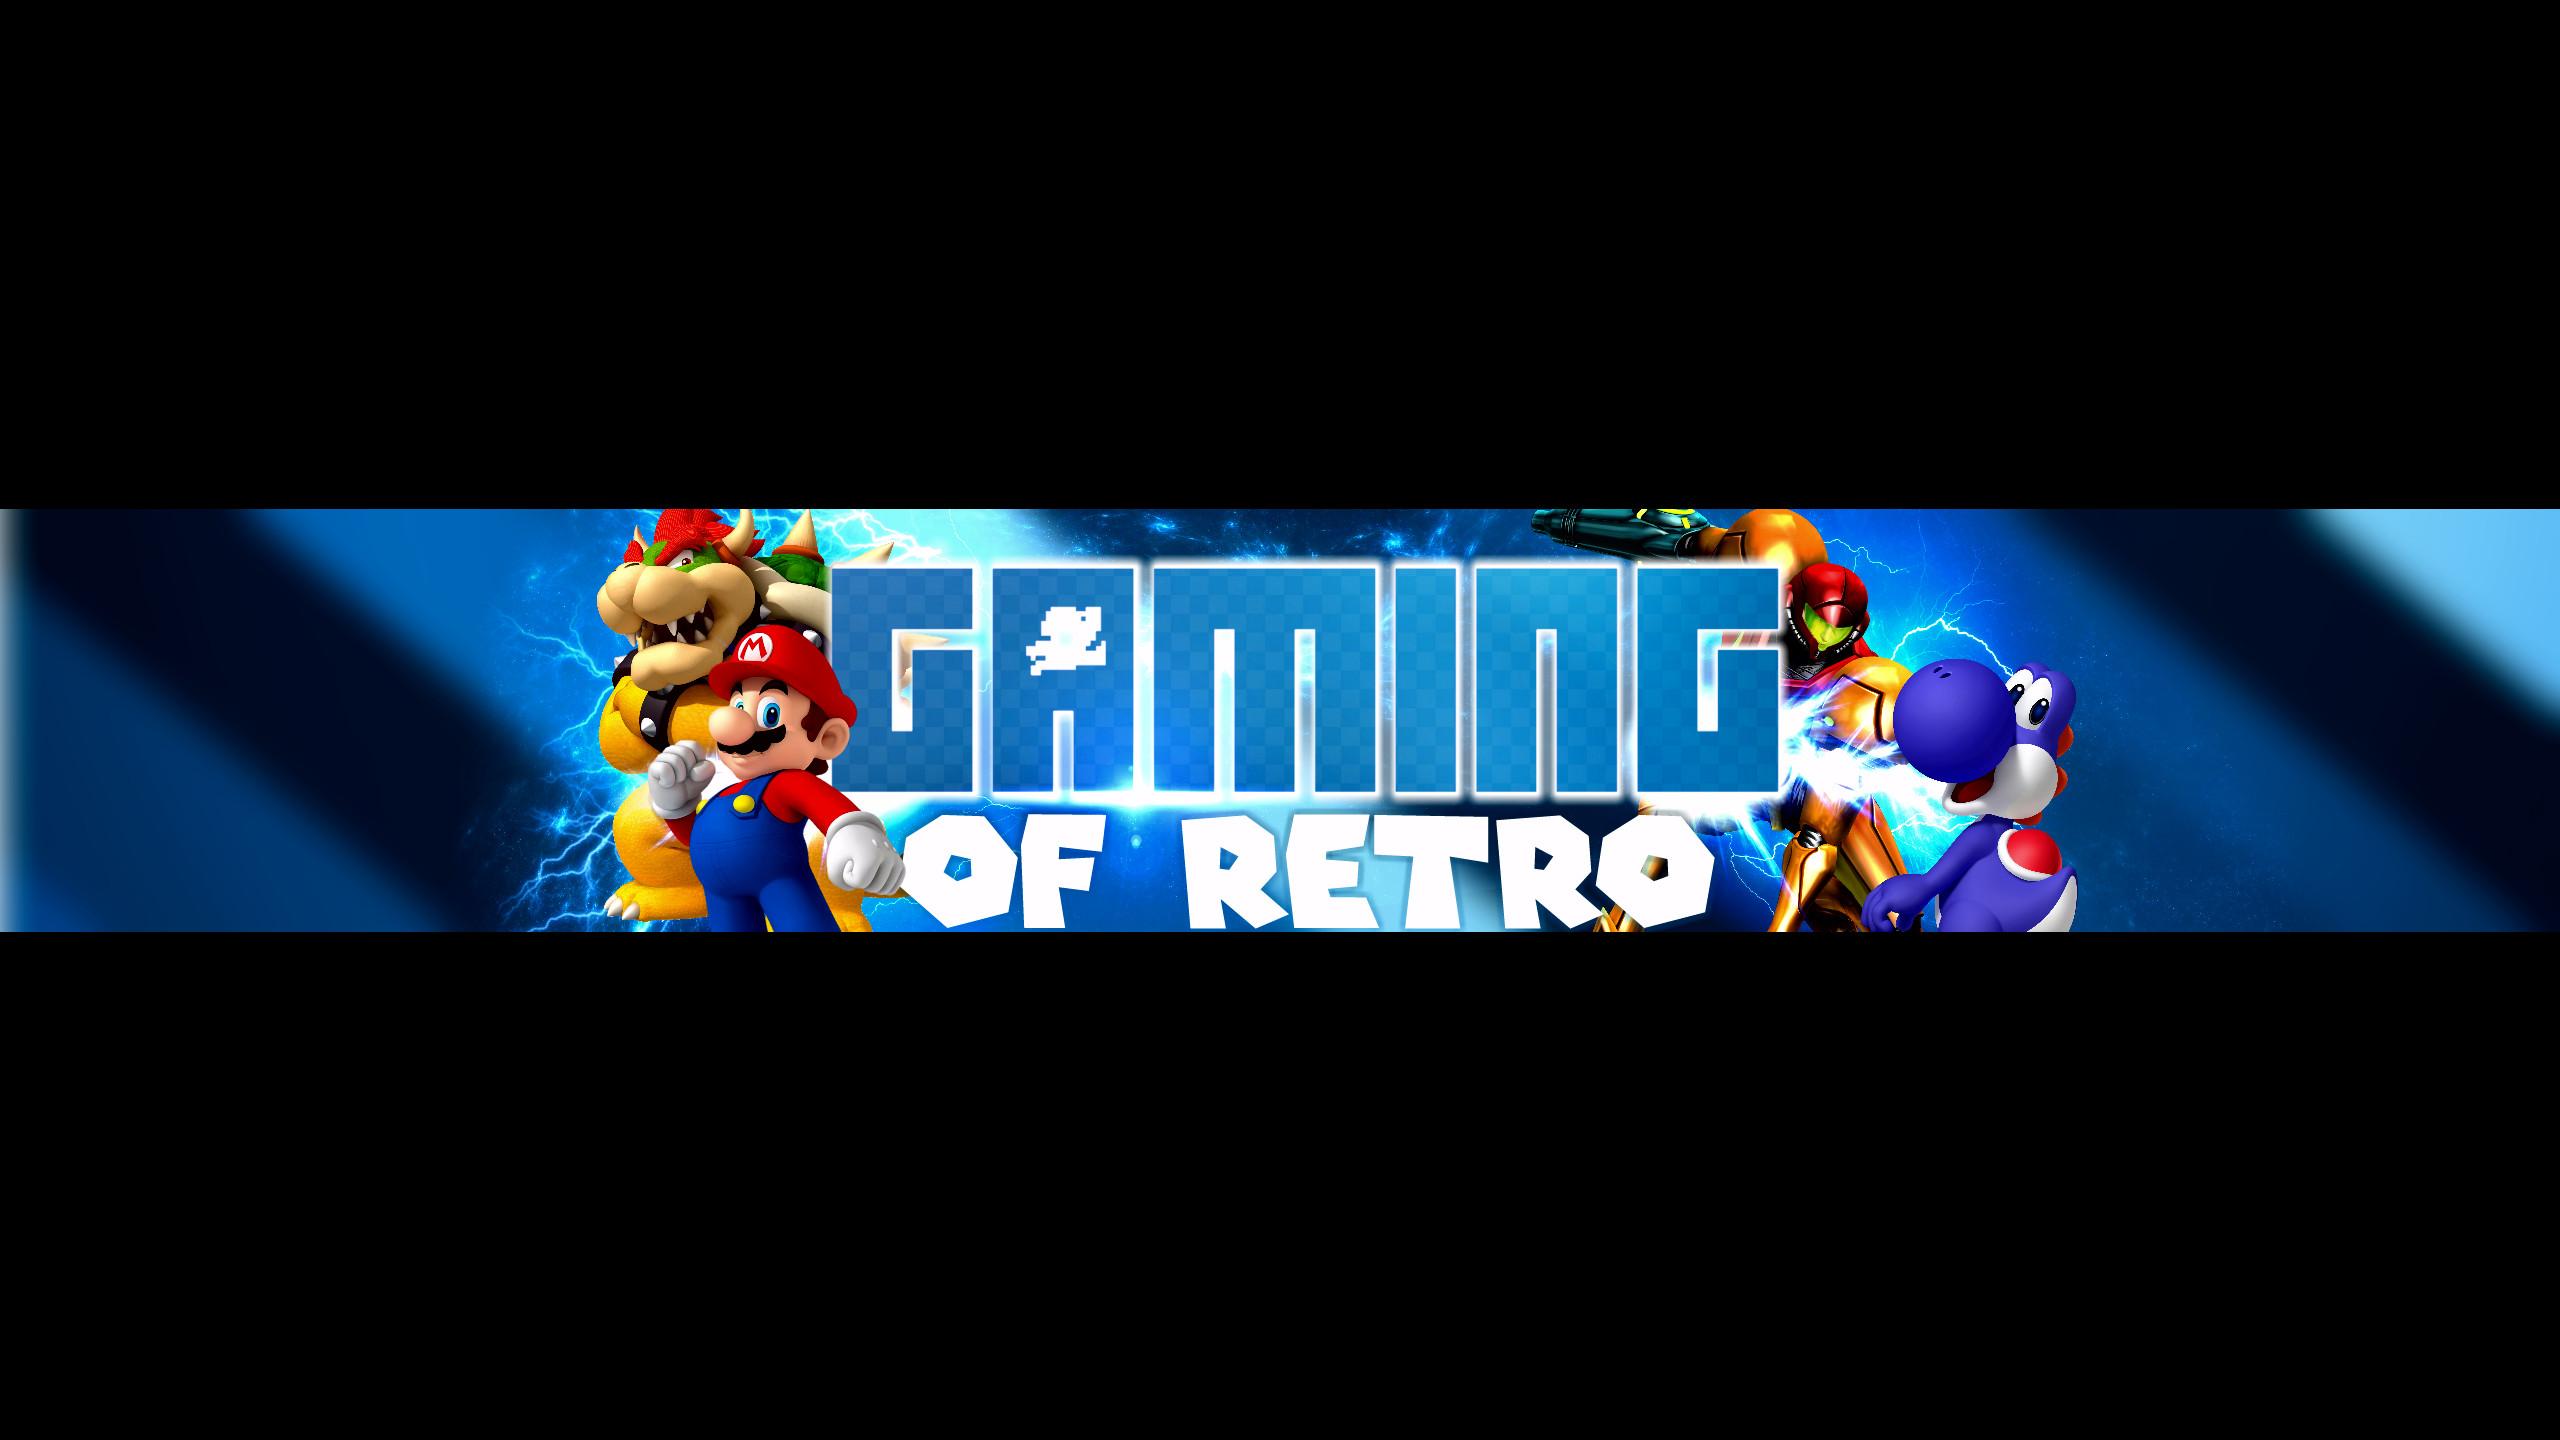 … Gaming of Retro – YouTube Banner by NitroRex by NitroRex